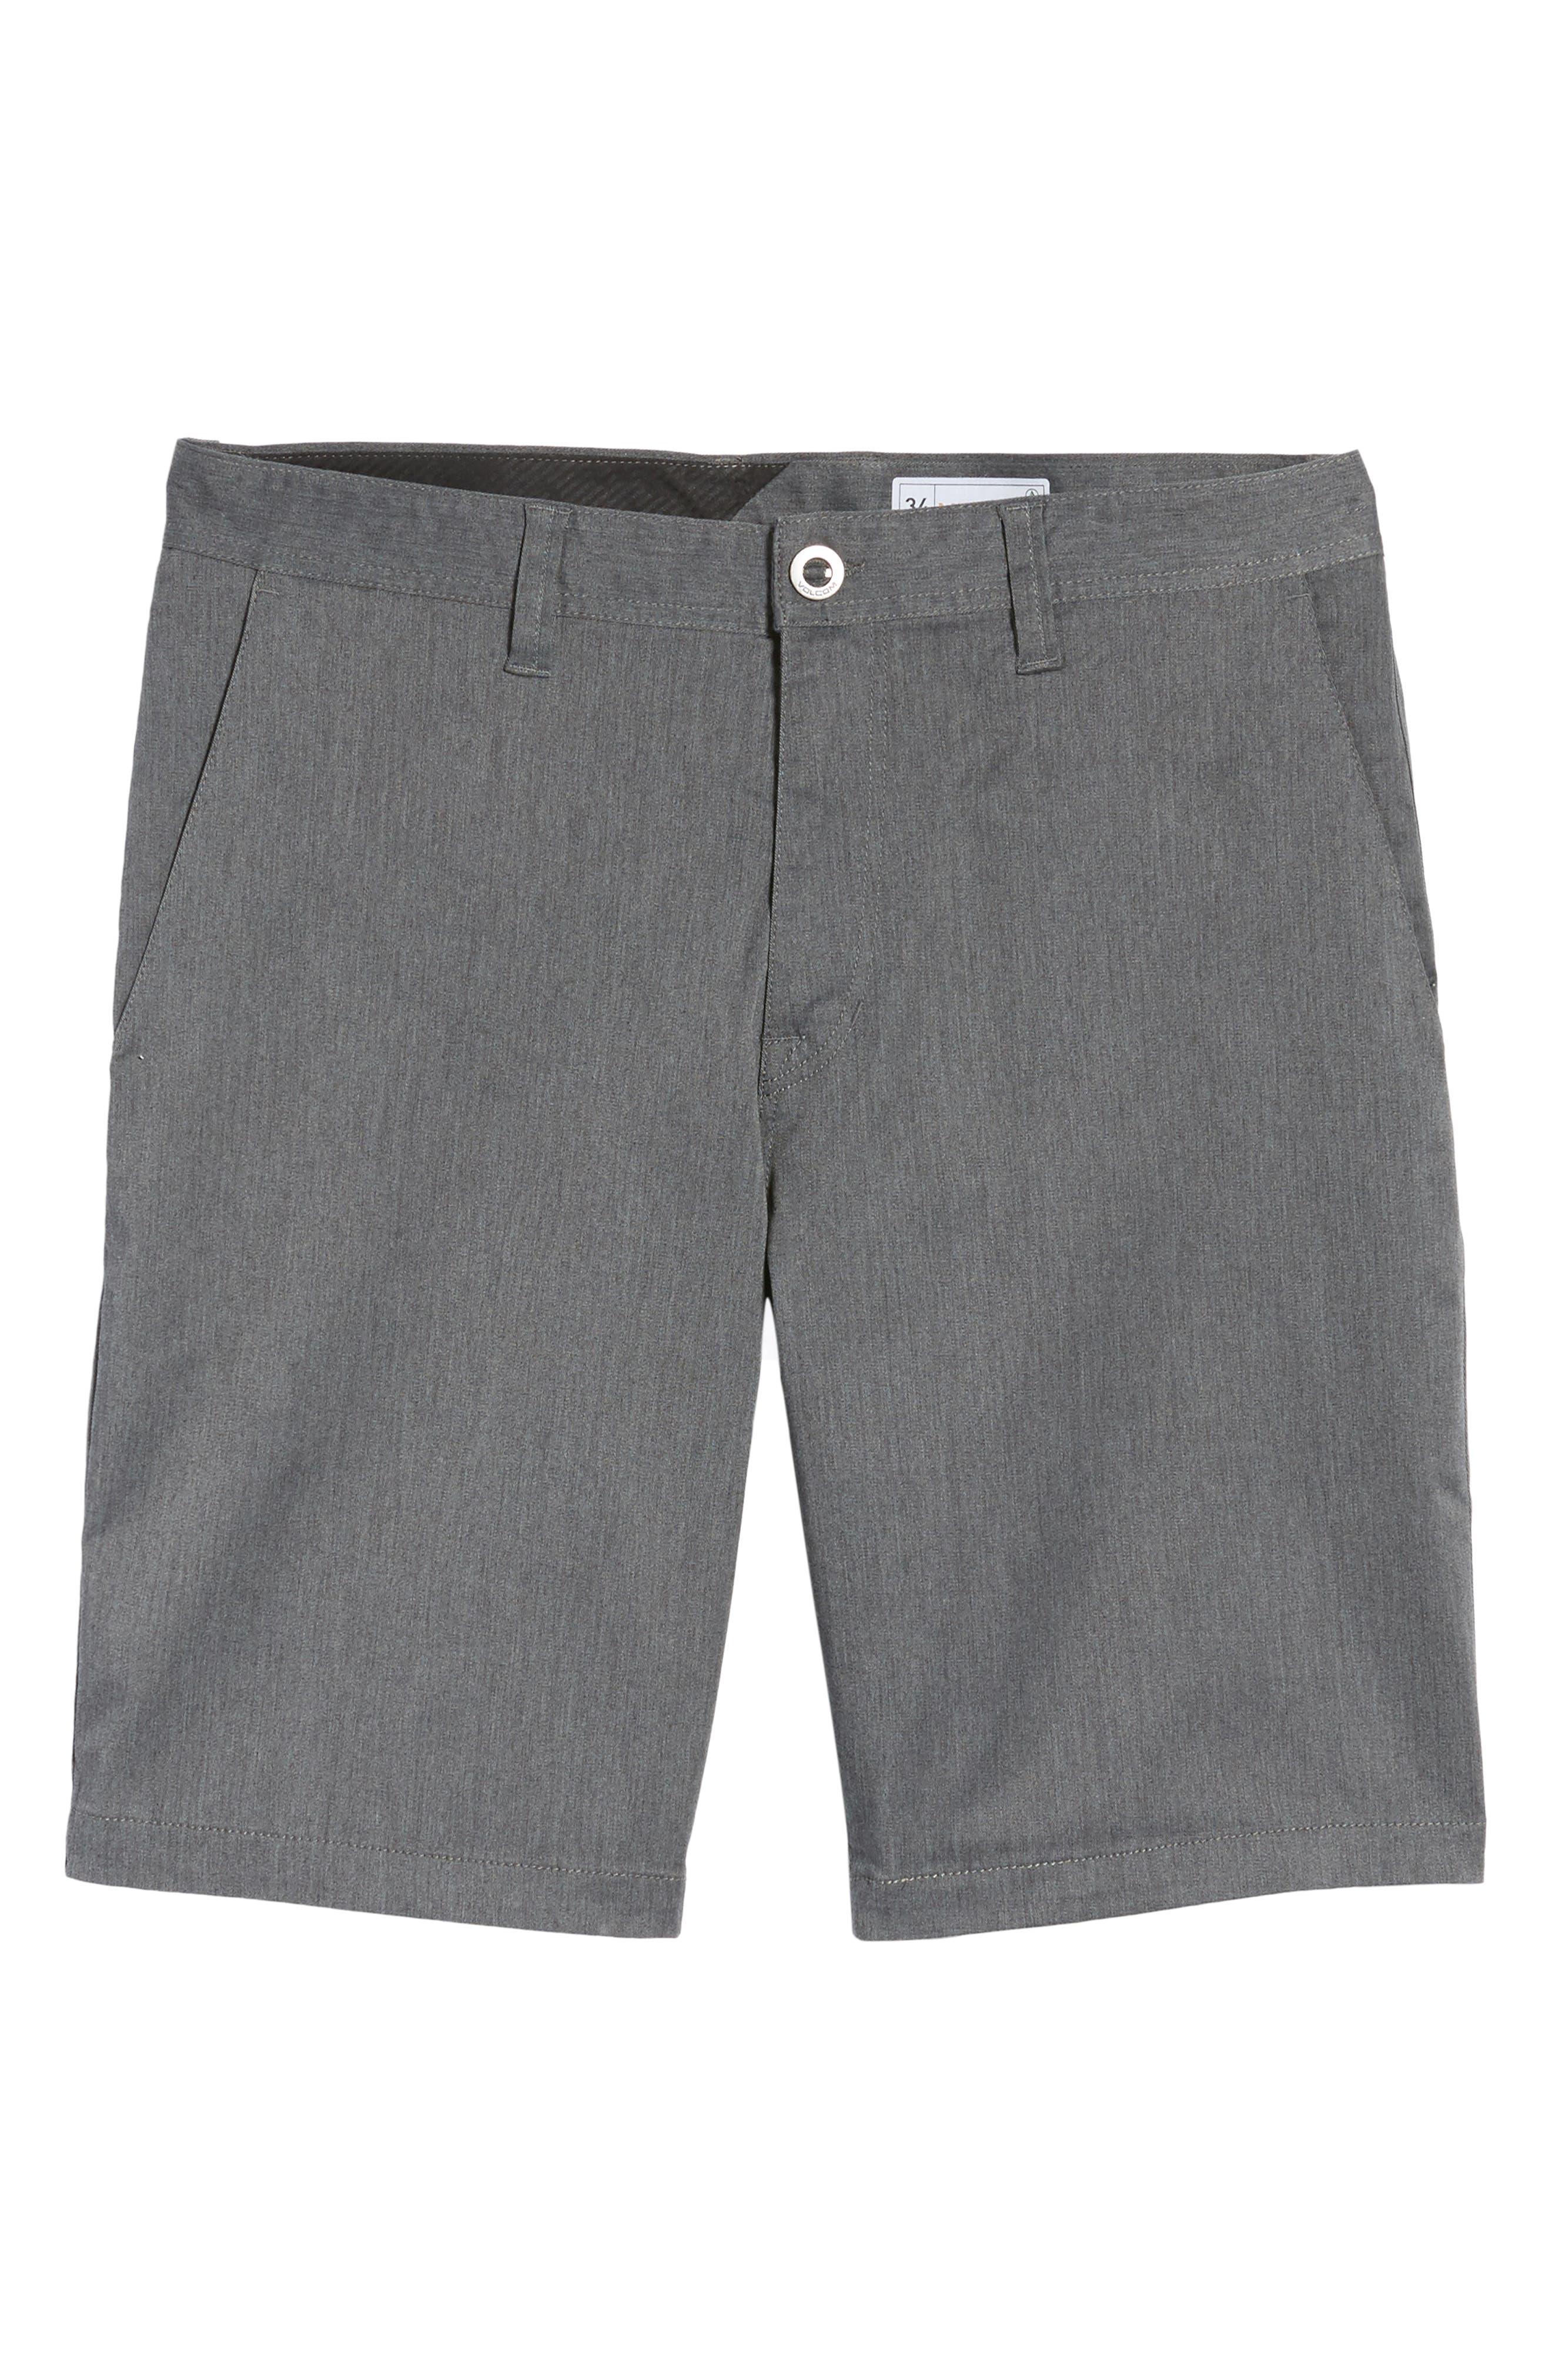 'Lightweight' Shorts,                         Main,                         color, 016